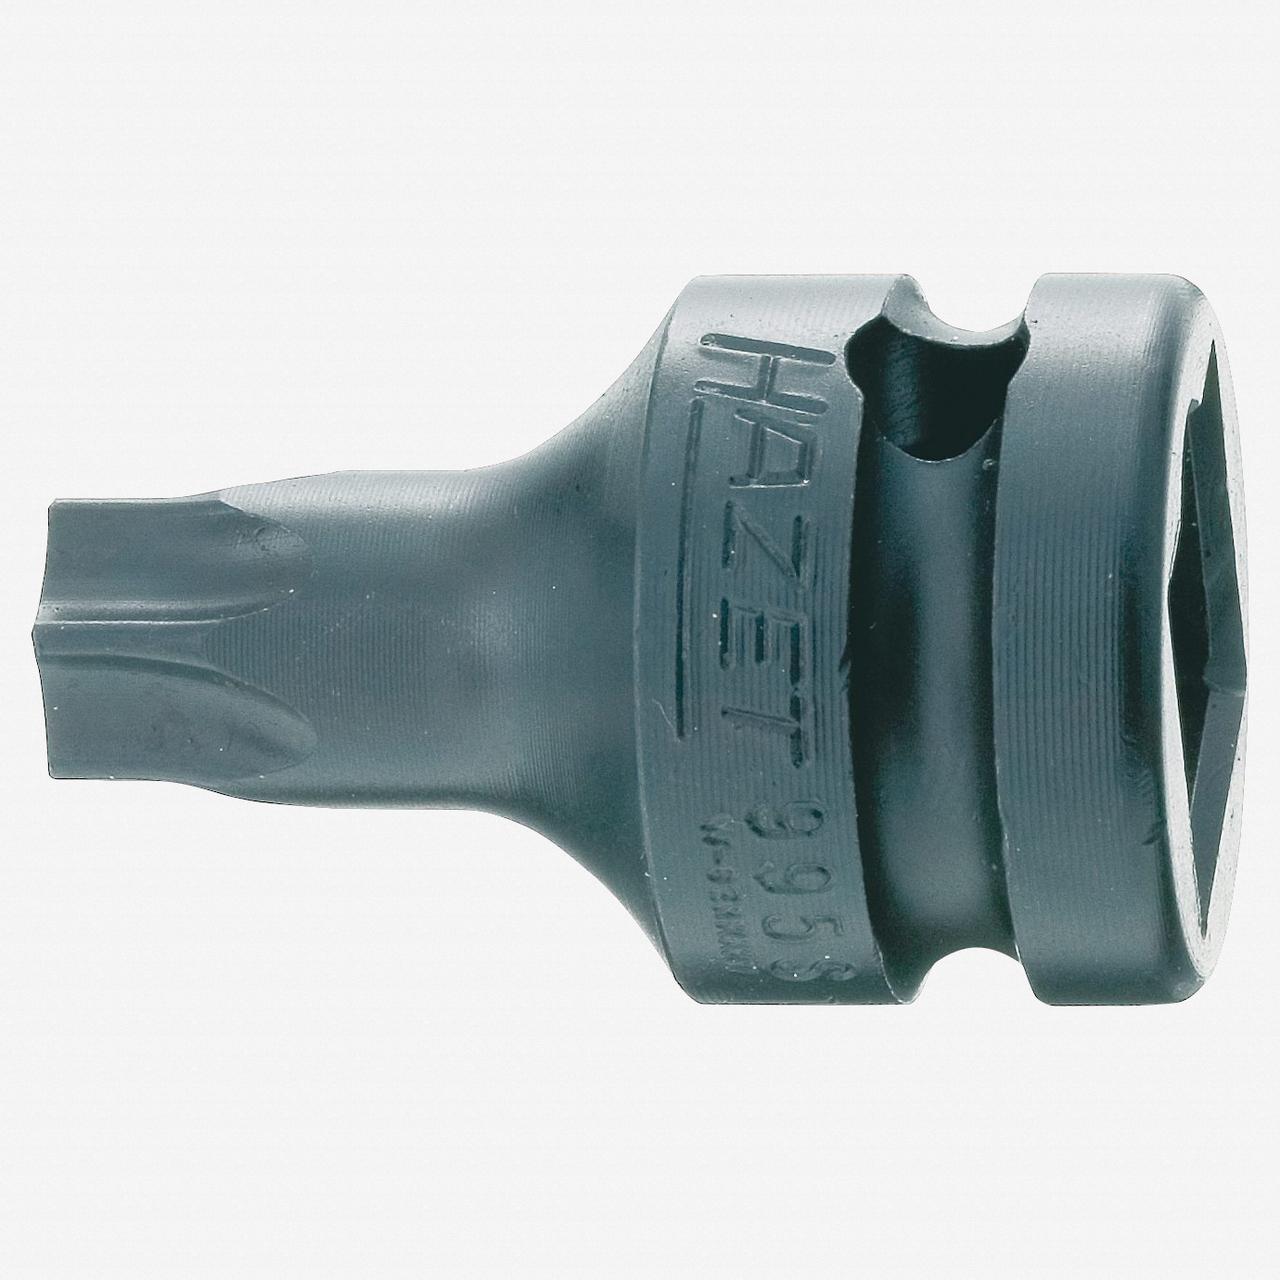 "Hazet 995S-T60 T60 Torx Impact Socket 1/2"" - KC Tool"